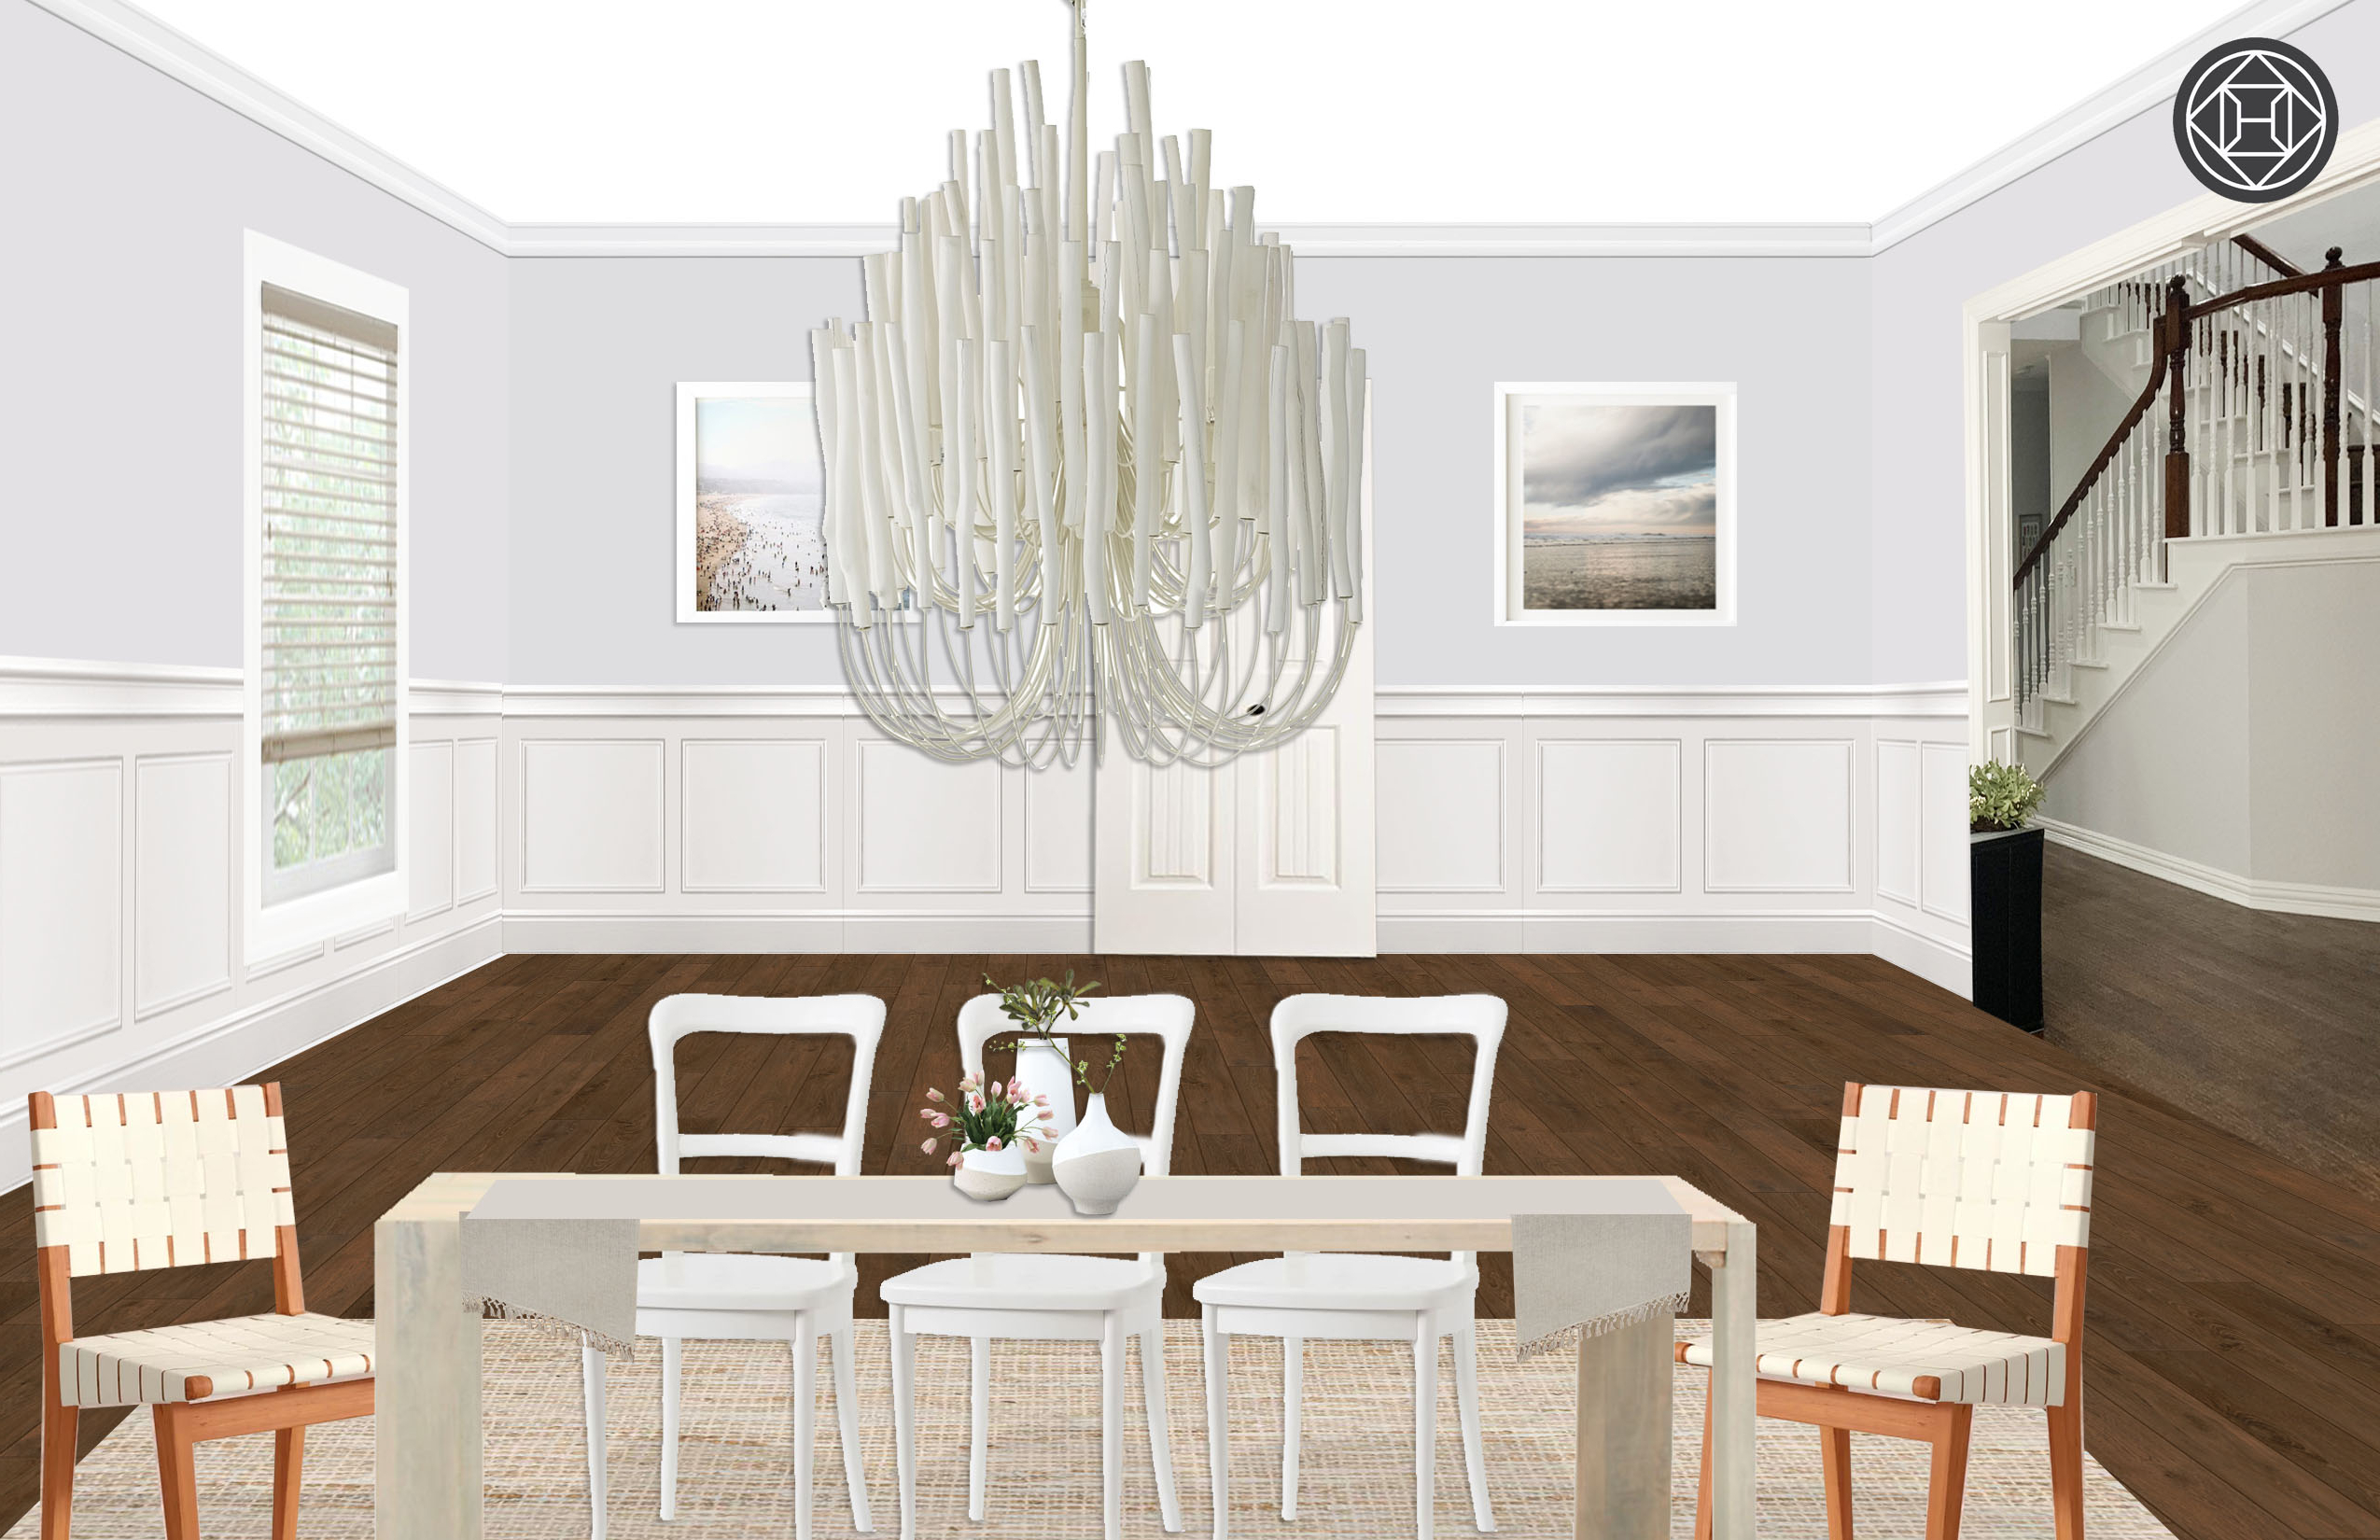 Seadrift Toscana Pedestal Extending Dining Tables For Popular Bohemian, Coastal Dining Room Designhavenly Interior (View 16 of 25)